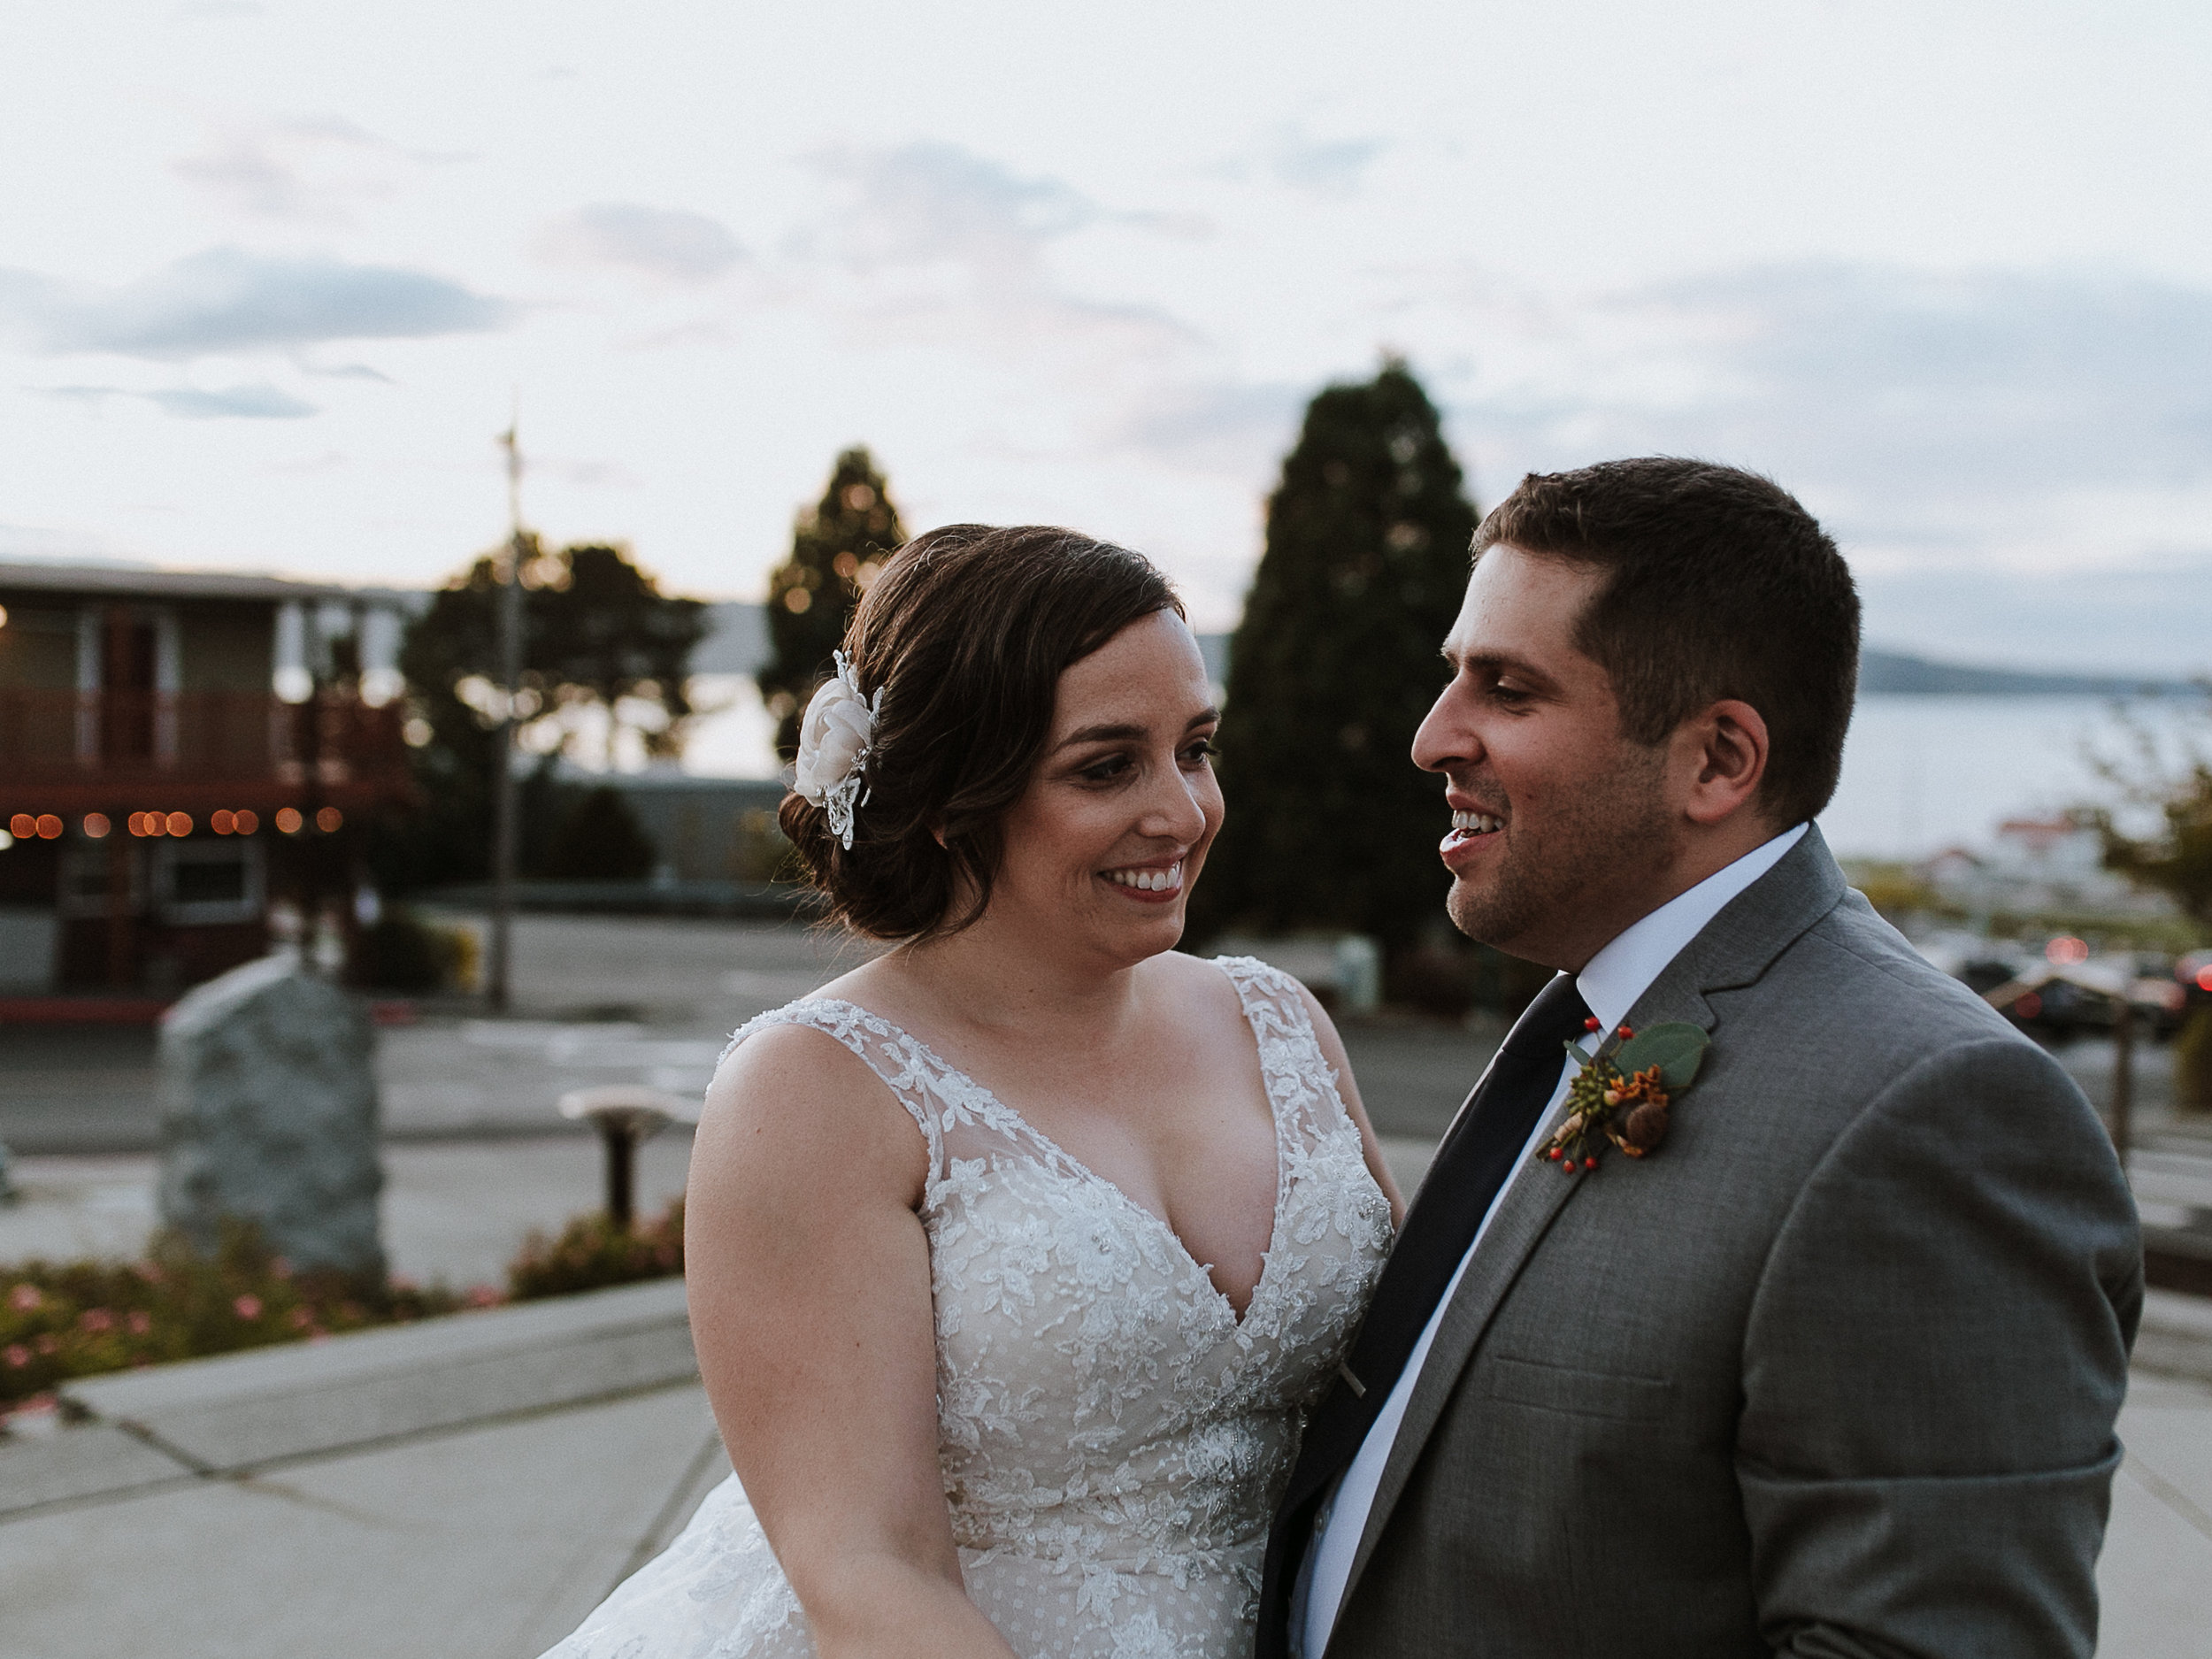 Erin Aasland Wedding Photographer bride & groom laughing